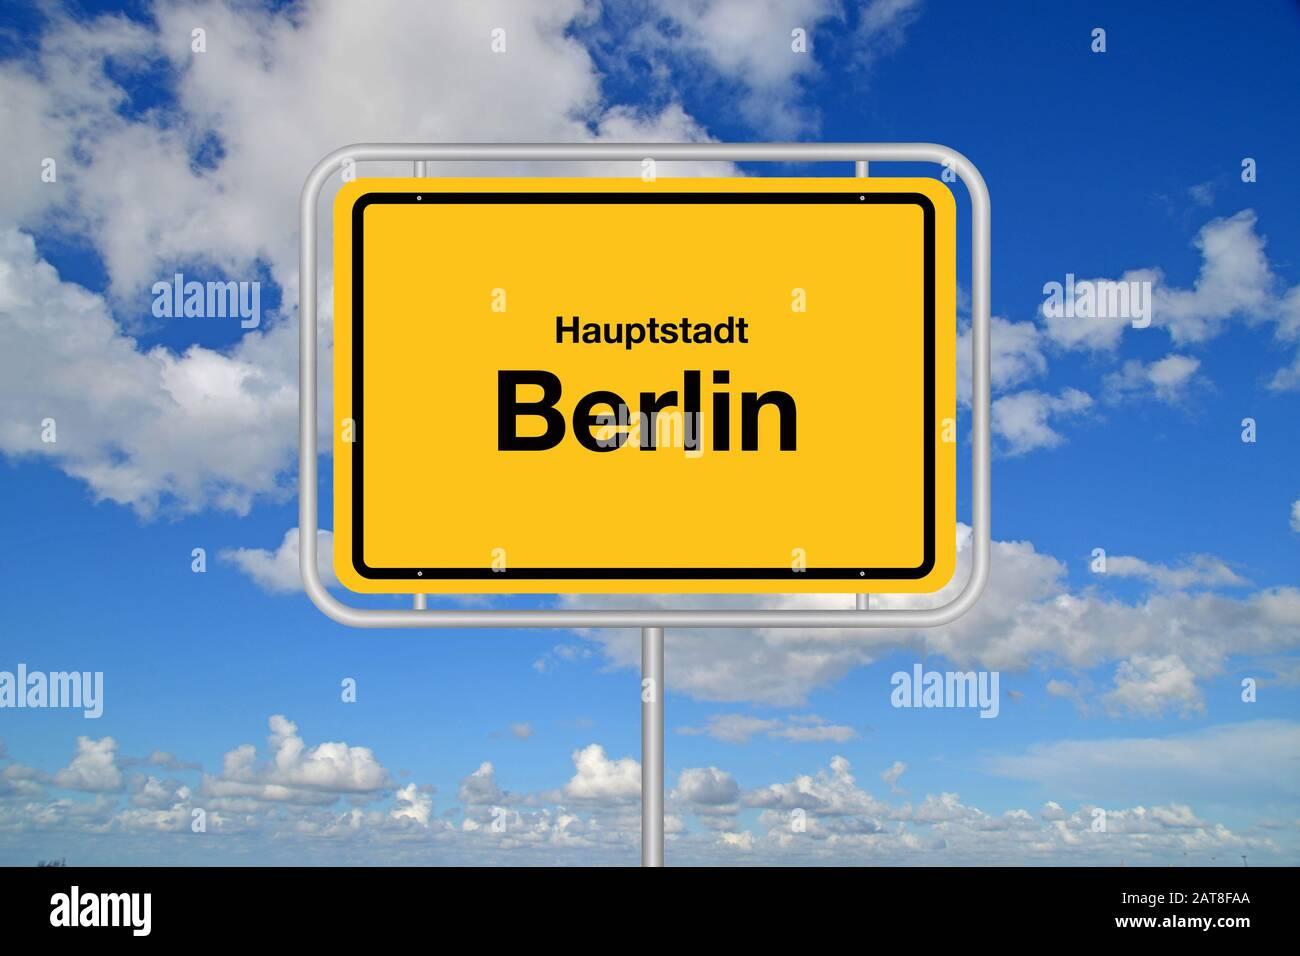 city sign Hauptstadt Berlin, capital Berlin against blue cloudy sky, Germany, Berlin Stock Photo